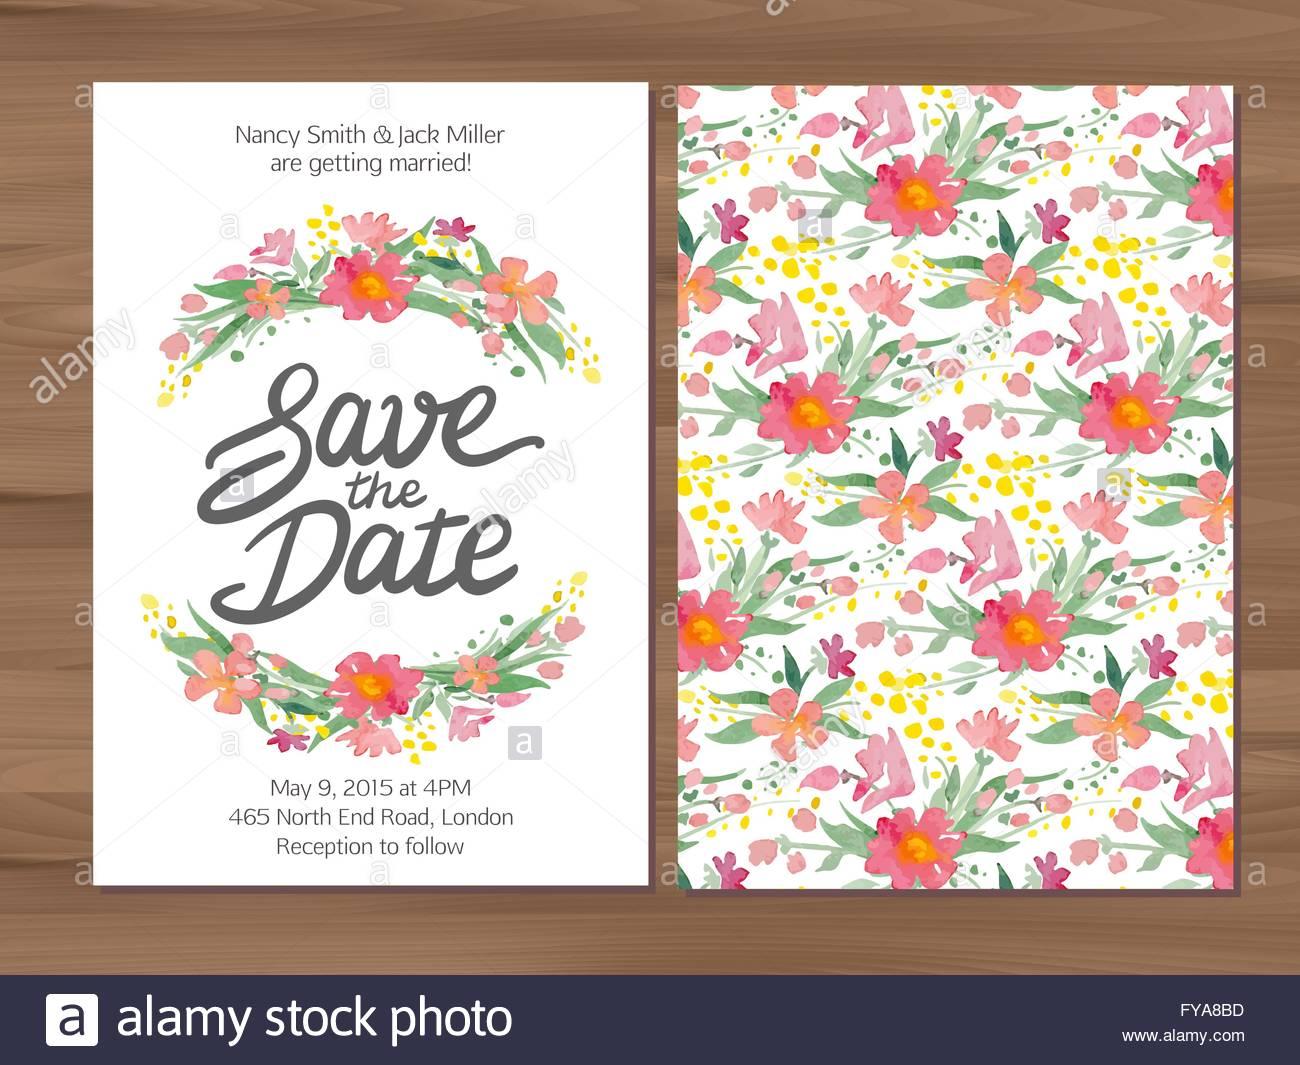 Vector wedding invitation with watercolor flowers and hand drawn vector wedding invitation with watercolor flowers and hand drawn stopboris Choice Image